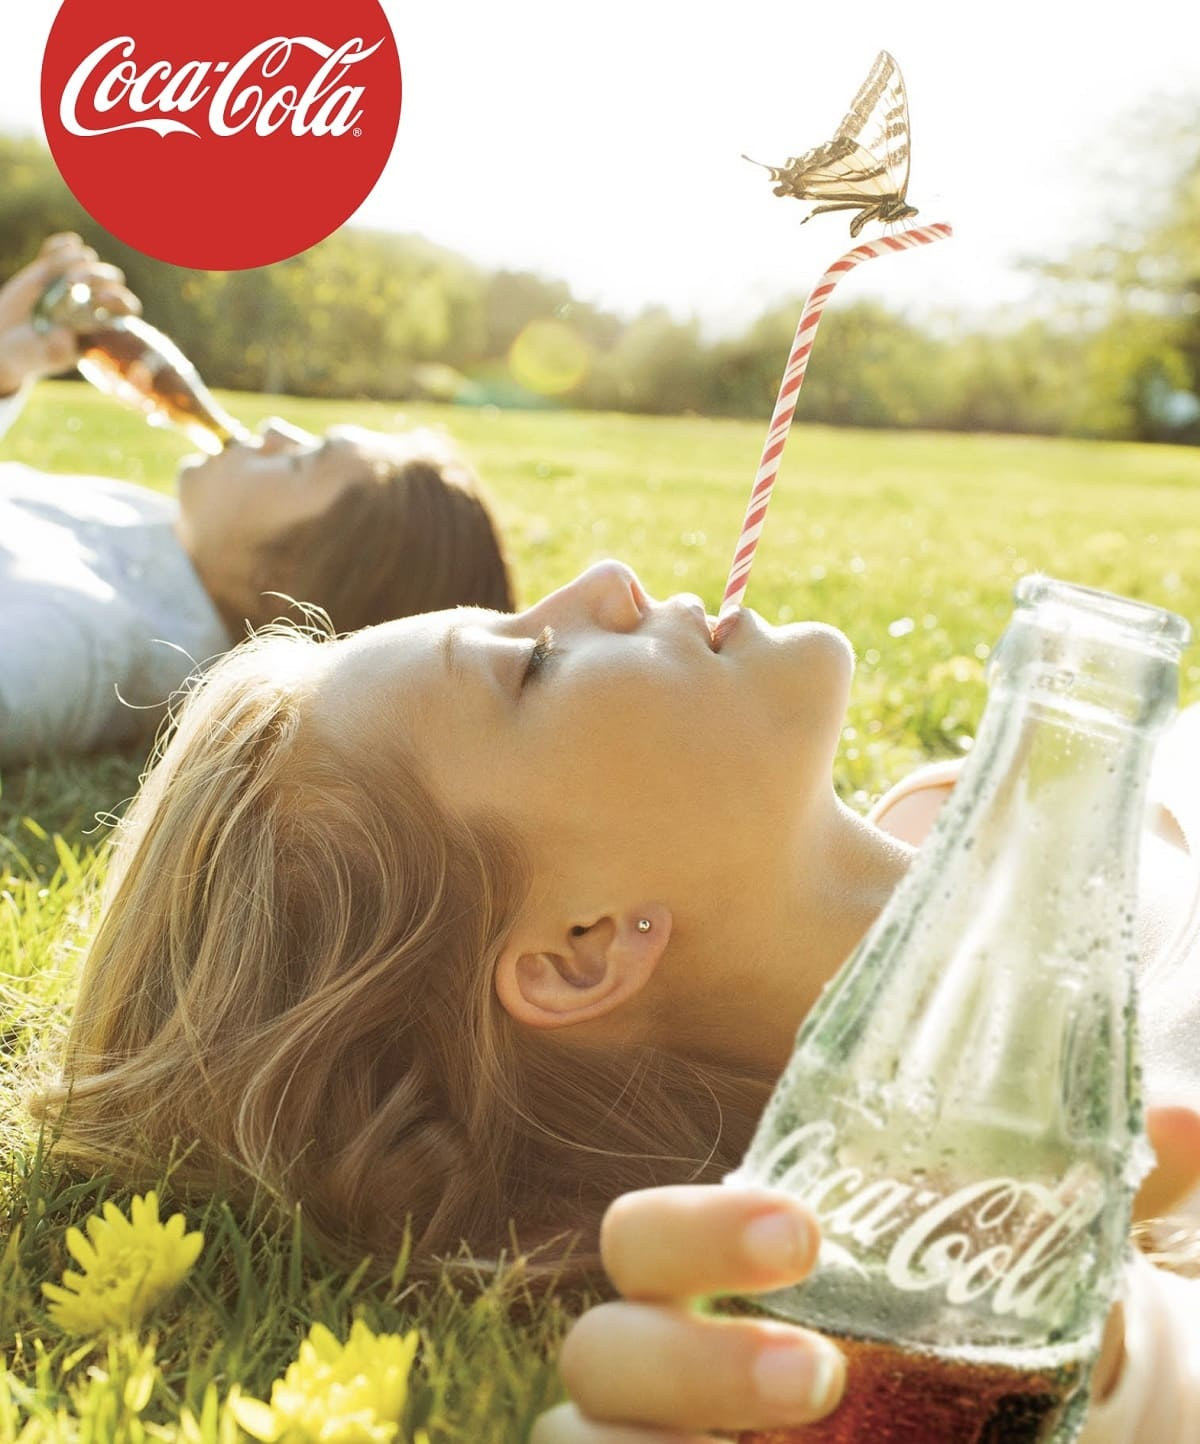 2016 Coca-Cola Calendar